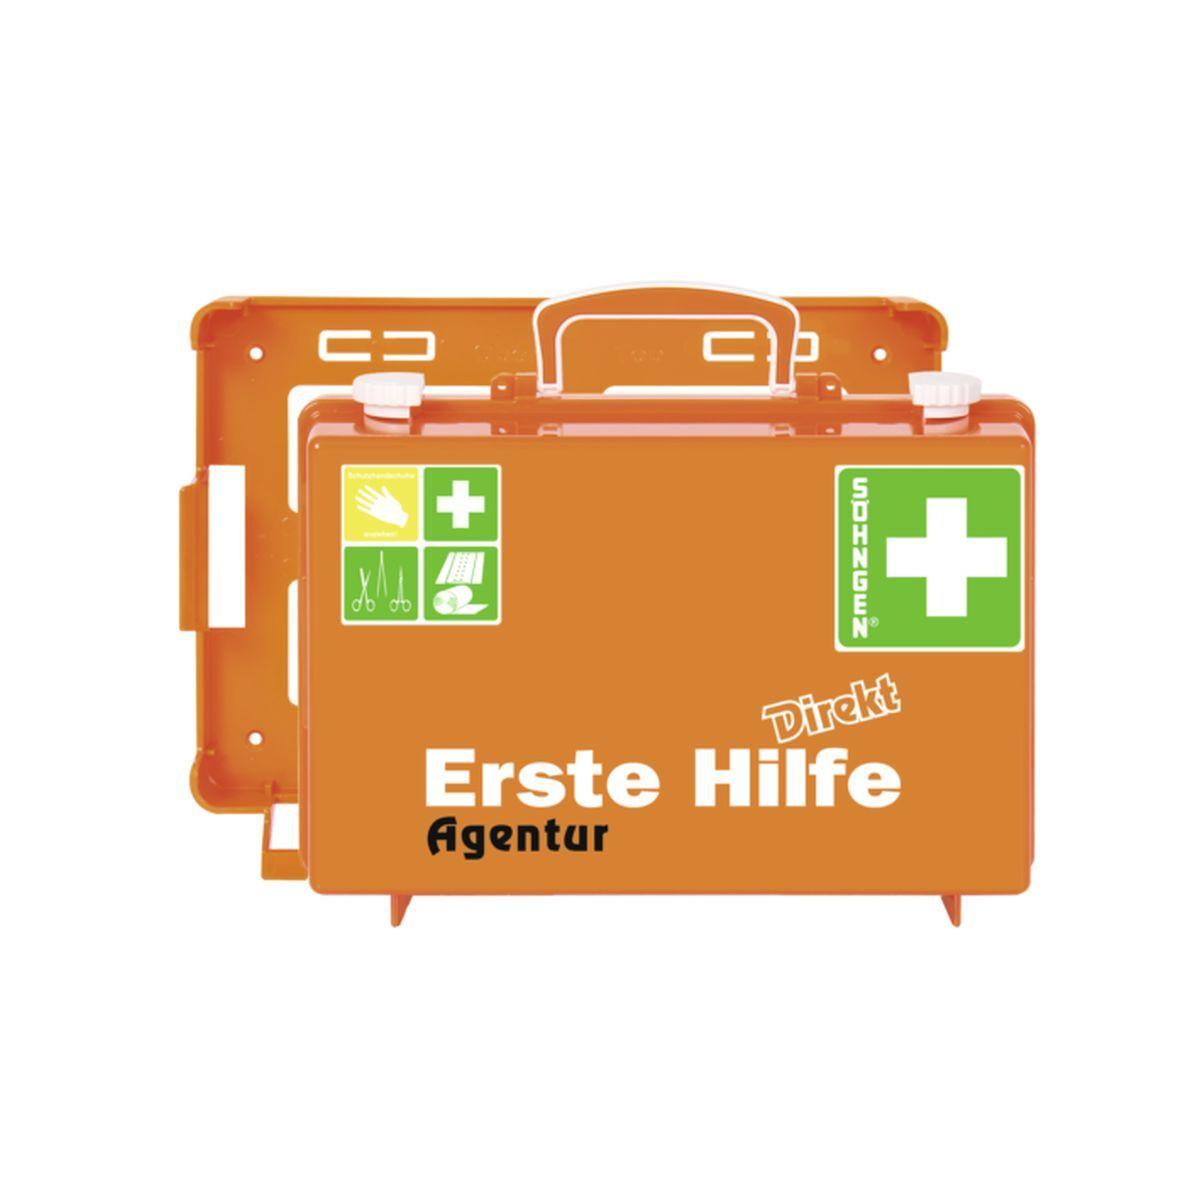 Erste Hilfe Koffer DIN 13157 DIREKT, Agentur